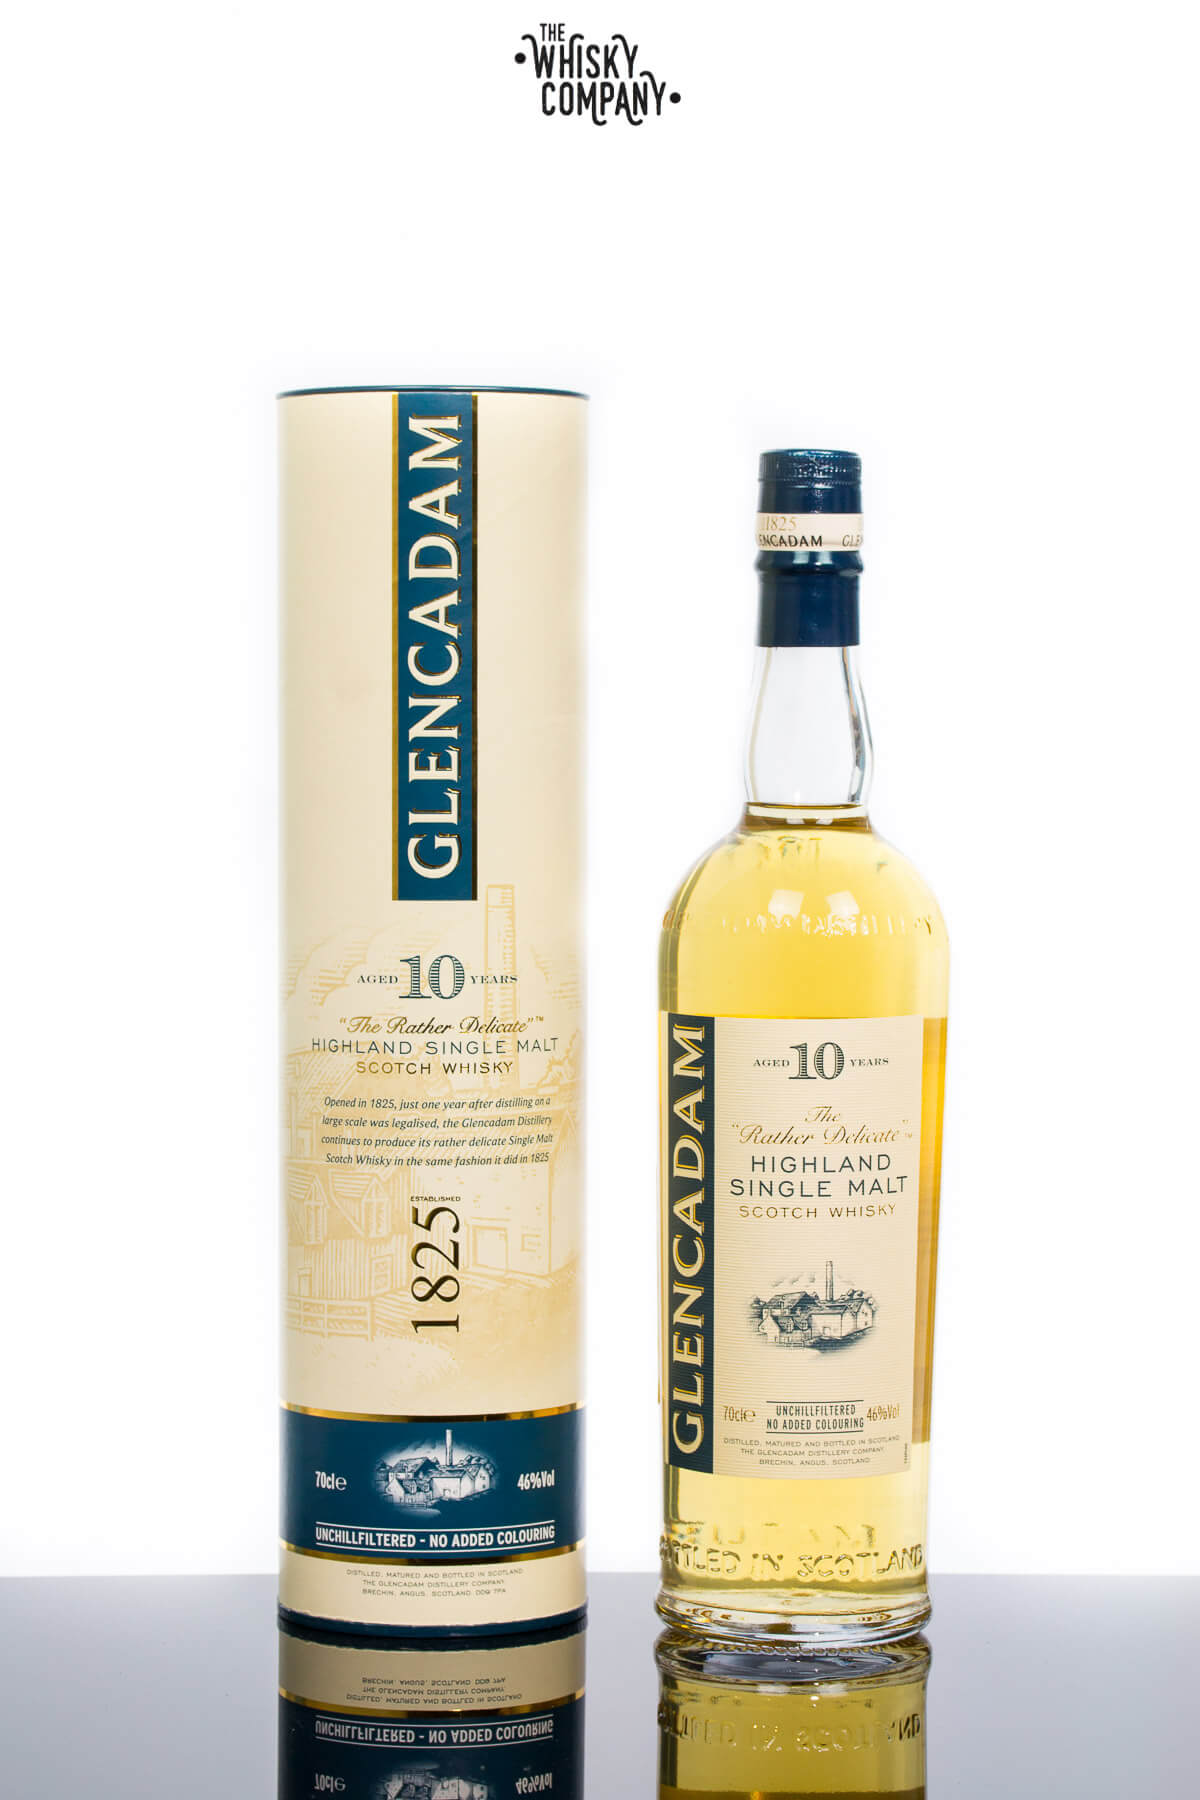 Glencadam Aged 10 Years Highland Single Malt Scotch Whisky (700ml)